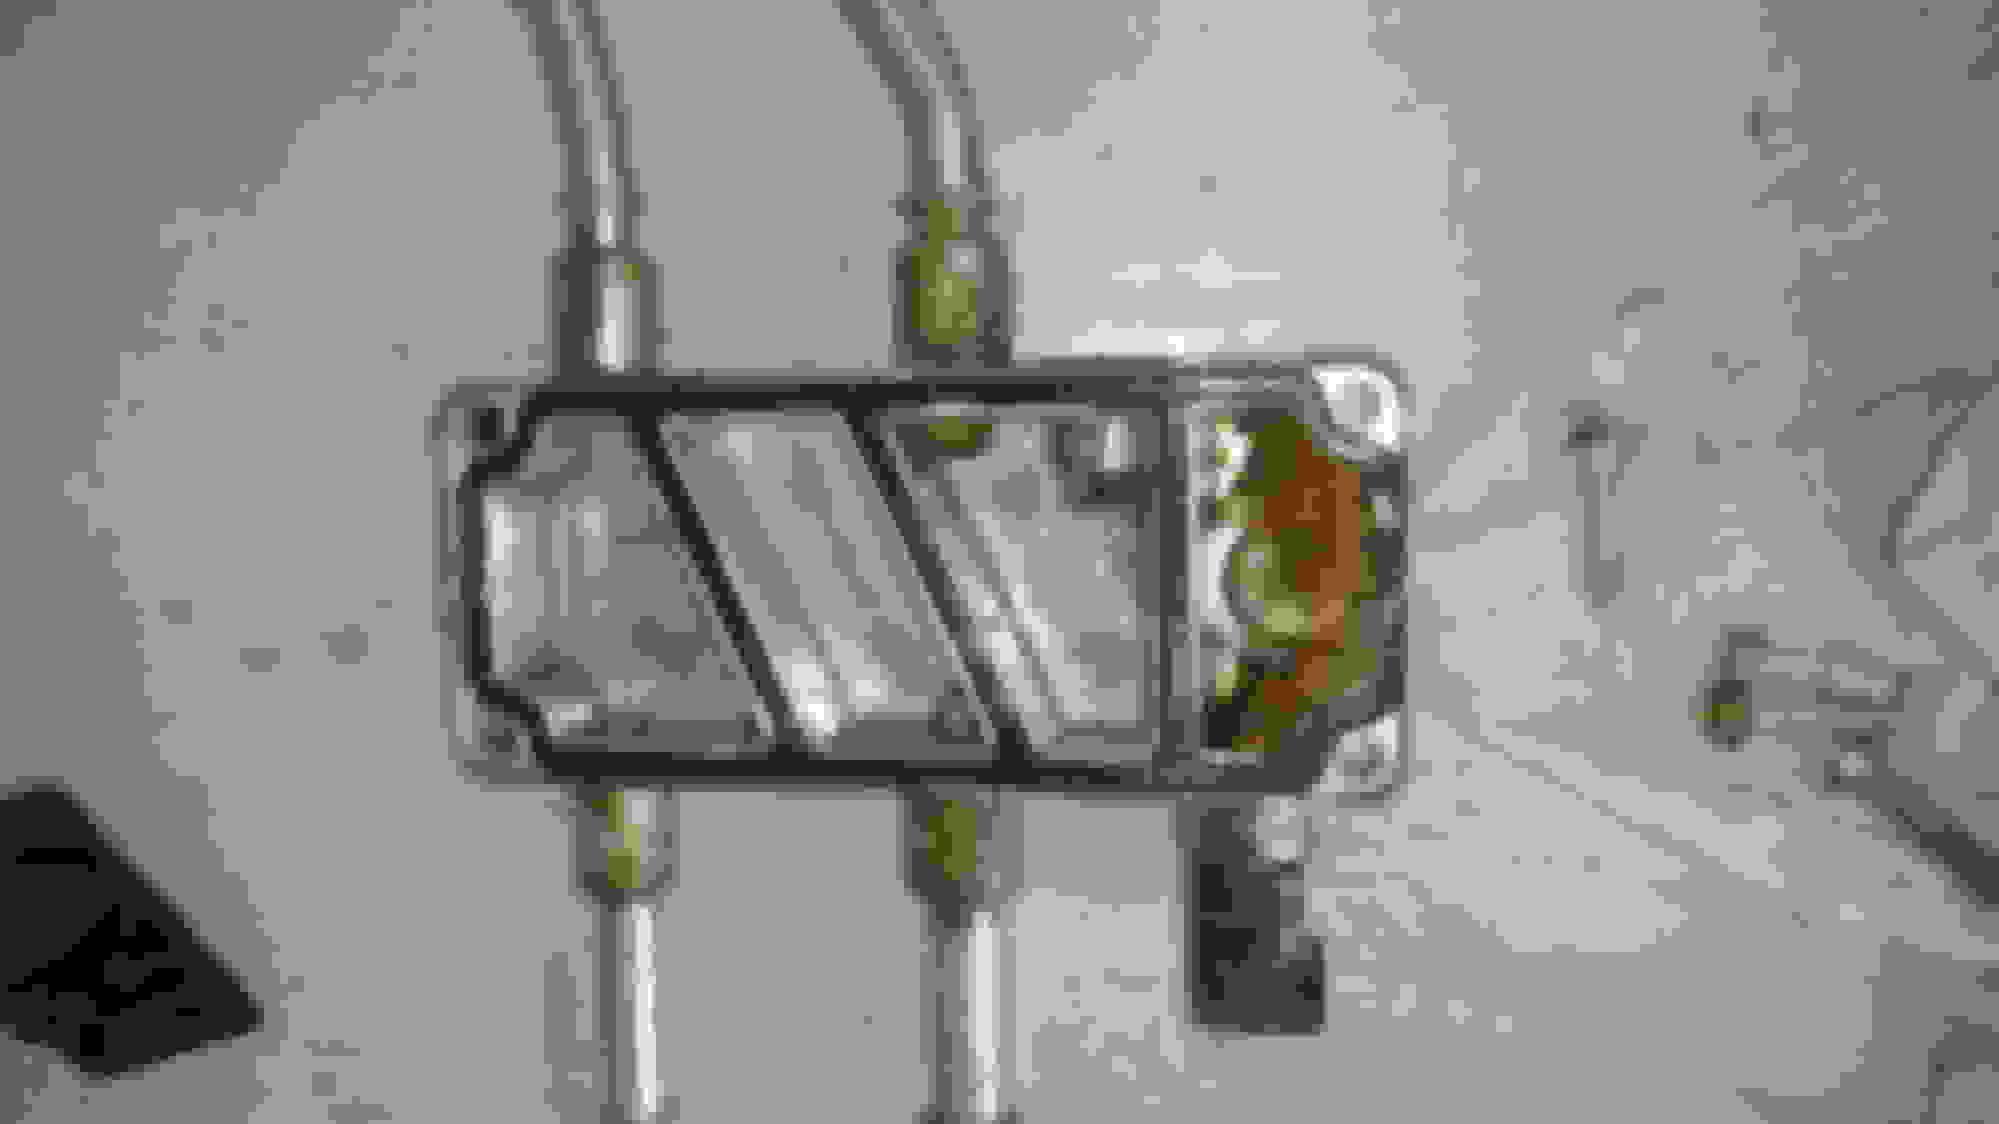 6.0 Powerstroke Crank No Start >> 2006 6 0 Powerstroke Crank No Start Bad Fuel Pump Ford